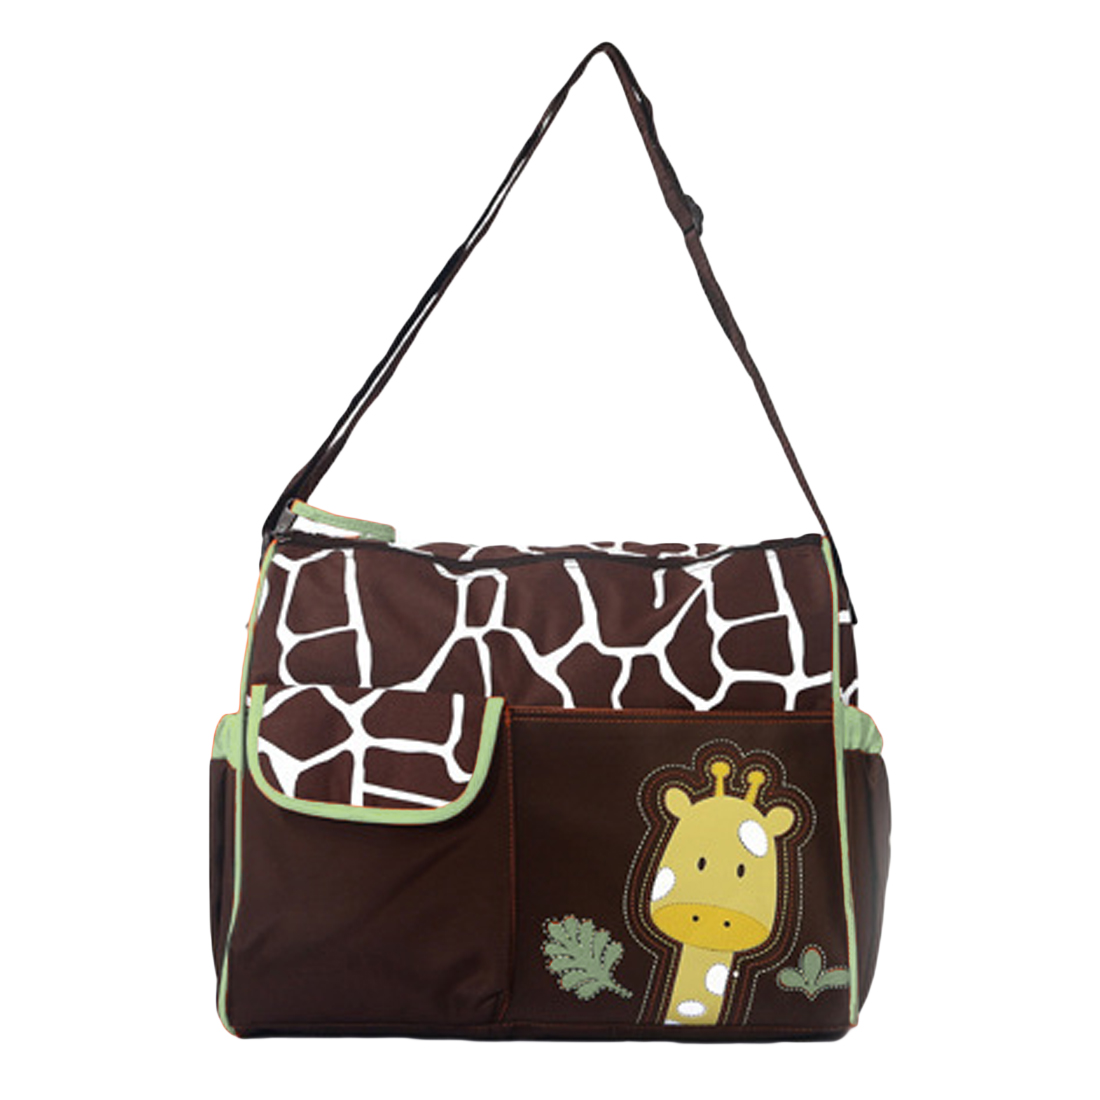 Mum Bag Diagonal Shoulder Large Capacity Baby Diaper Nappy Changing Bag Giraffe Style Baby Travel Nappy Bag Diaper Backpack